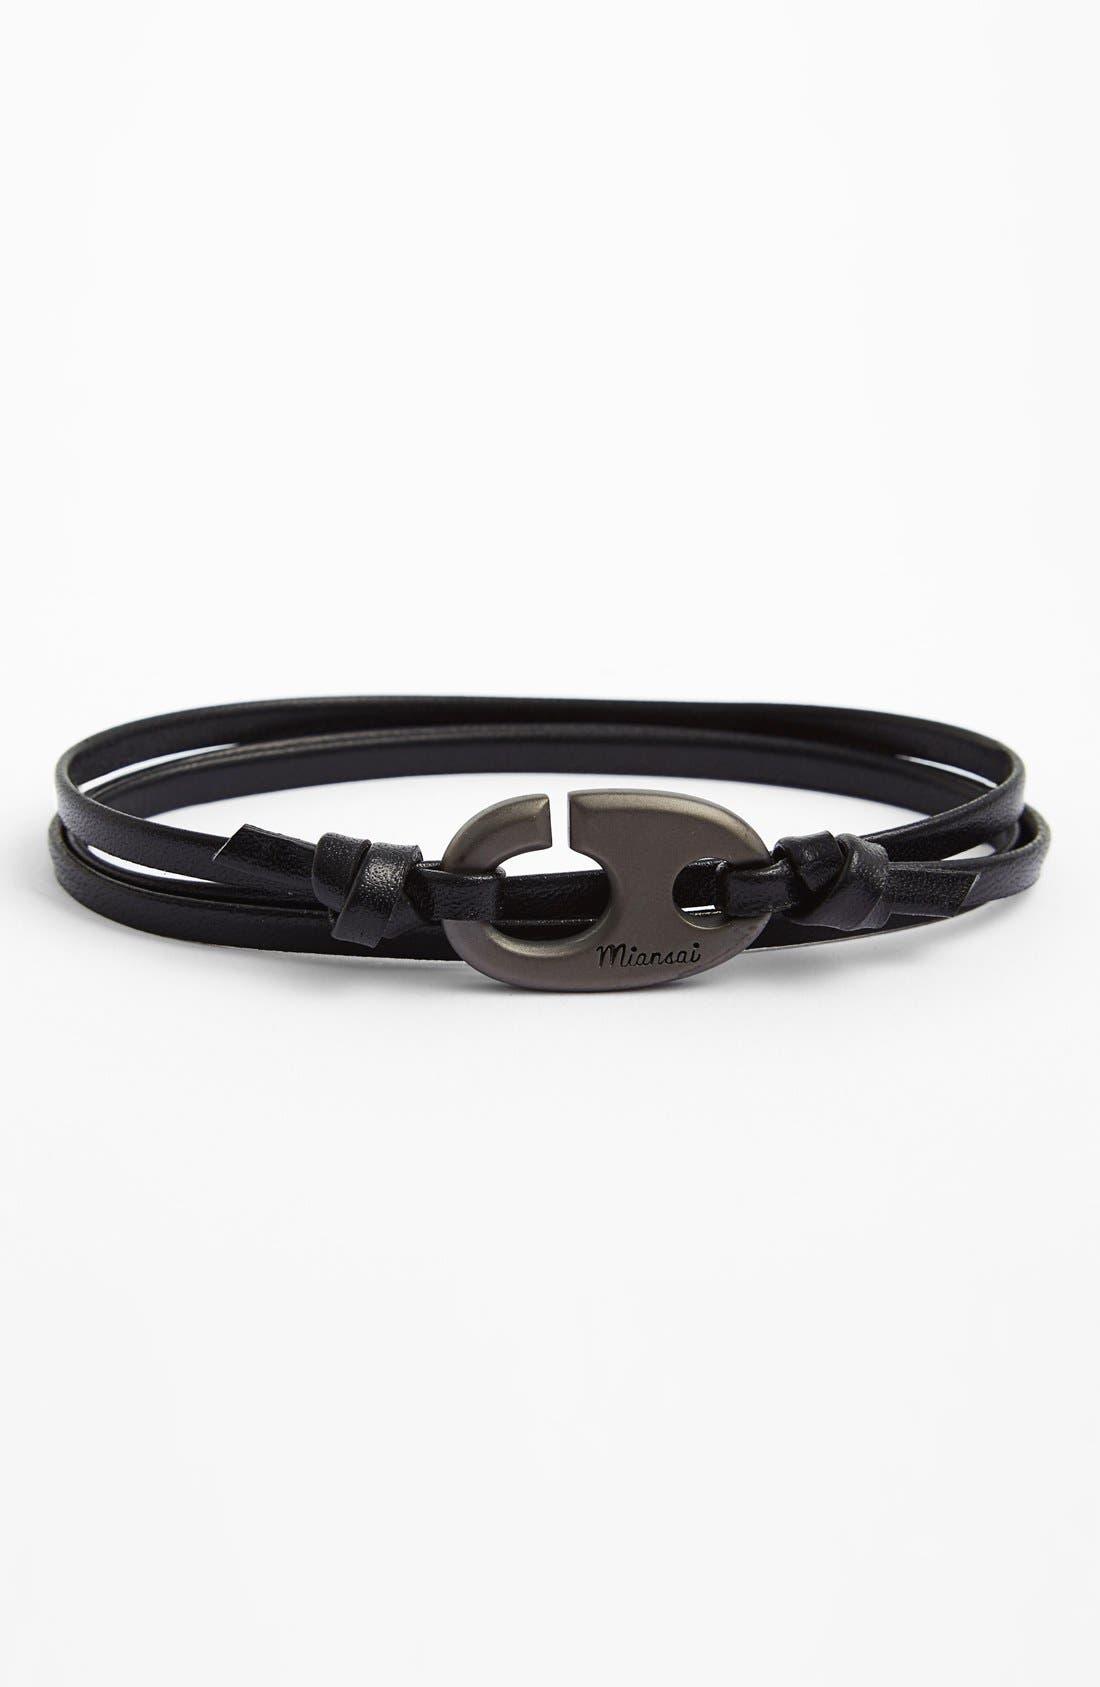 Main Image - Miansai Gold Plated Brummel Hook Leather Bracelet